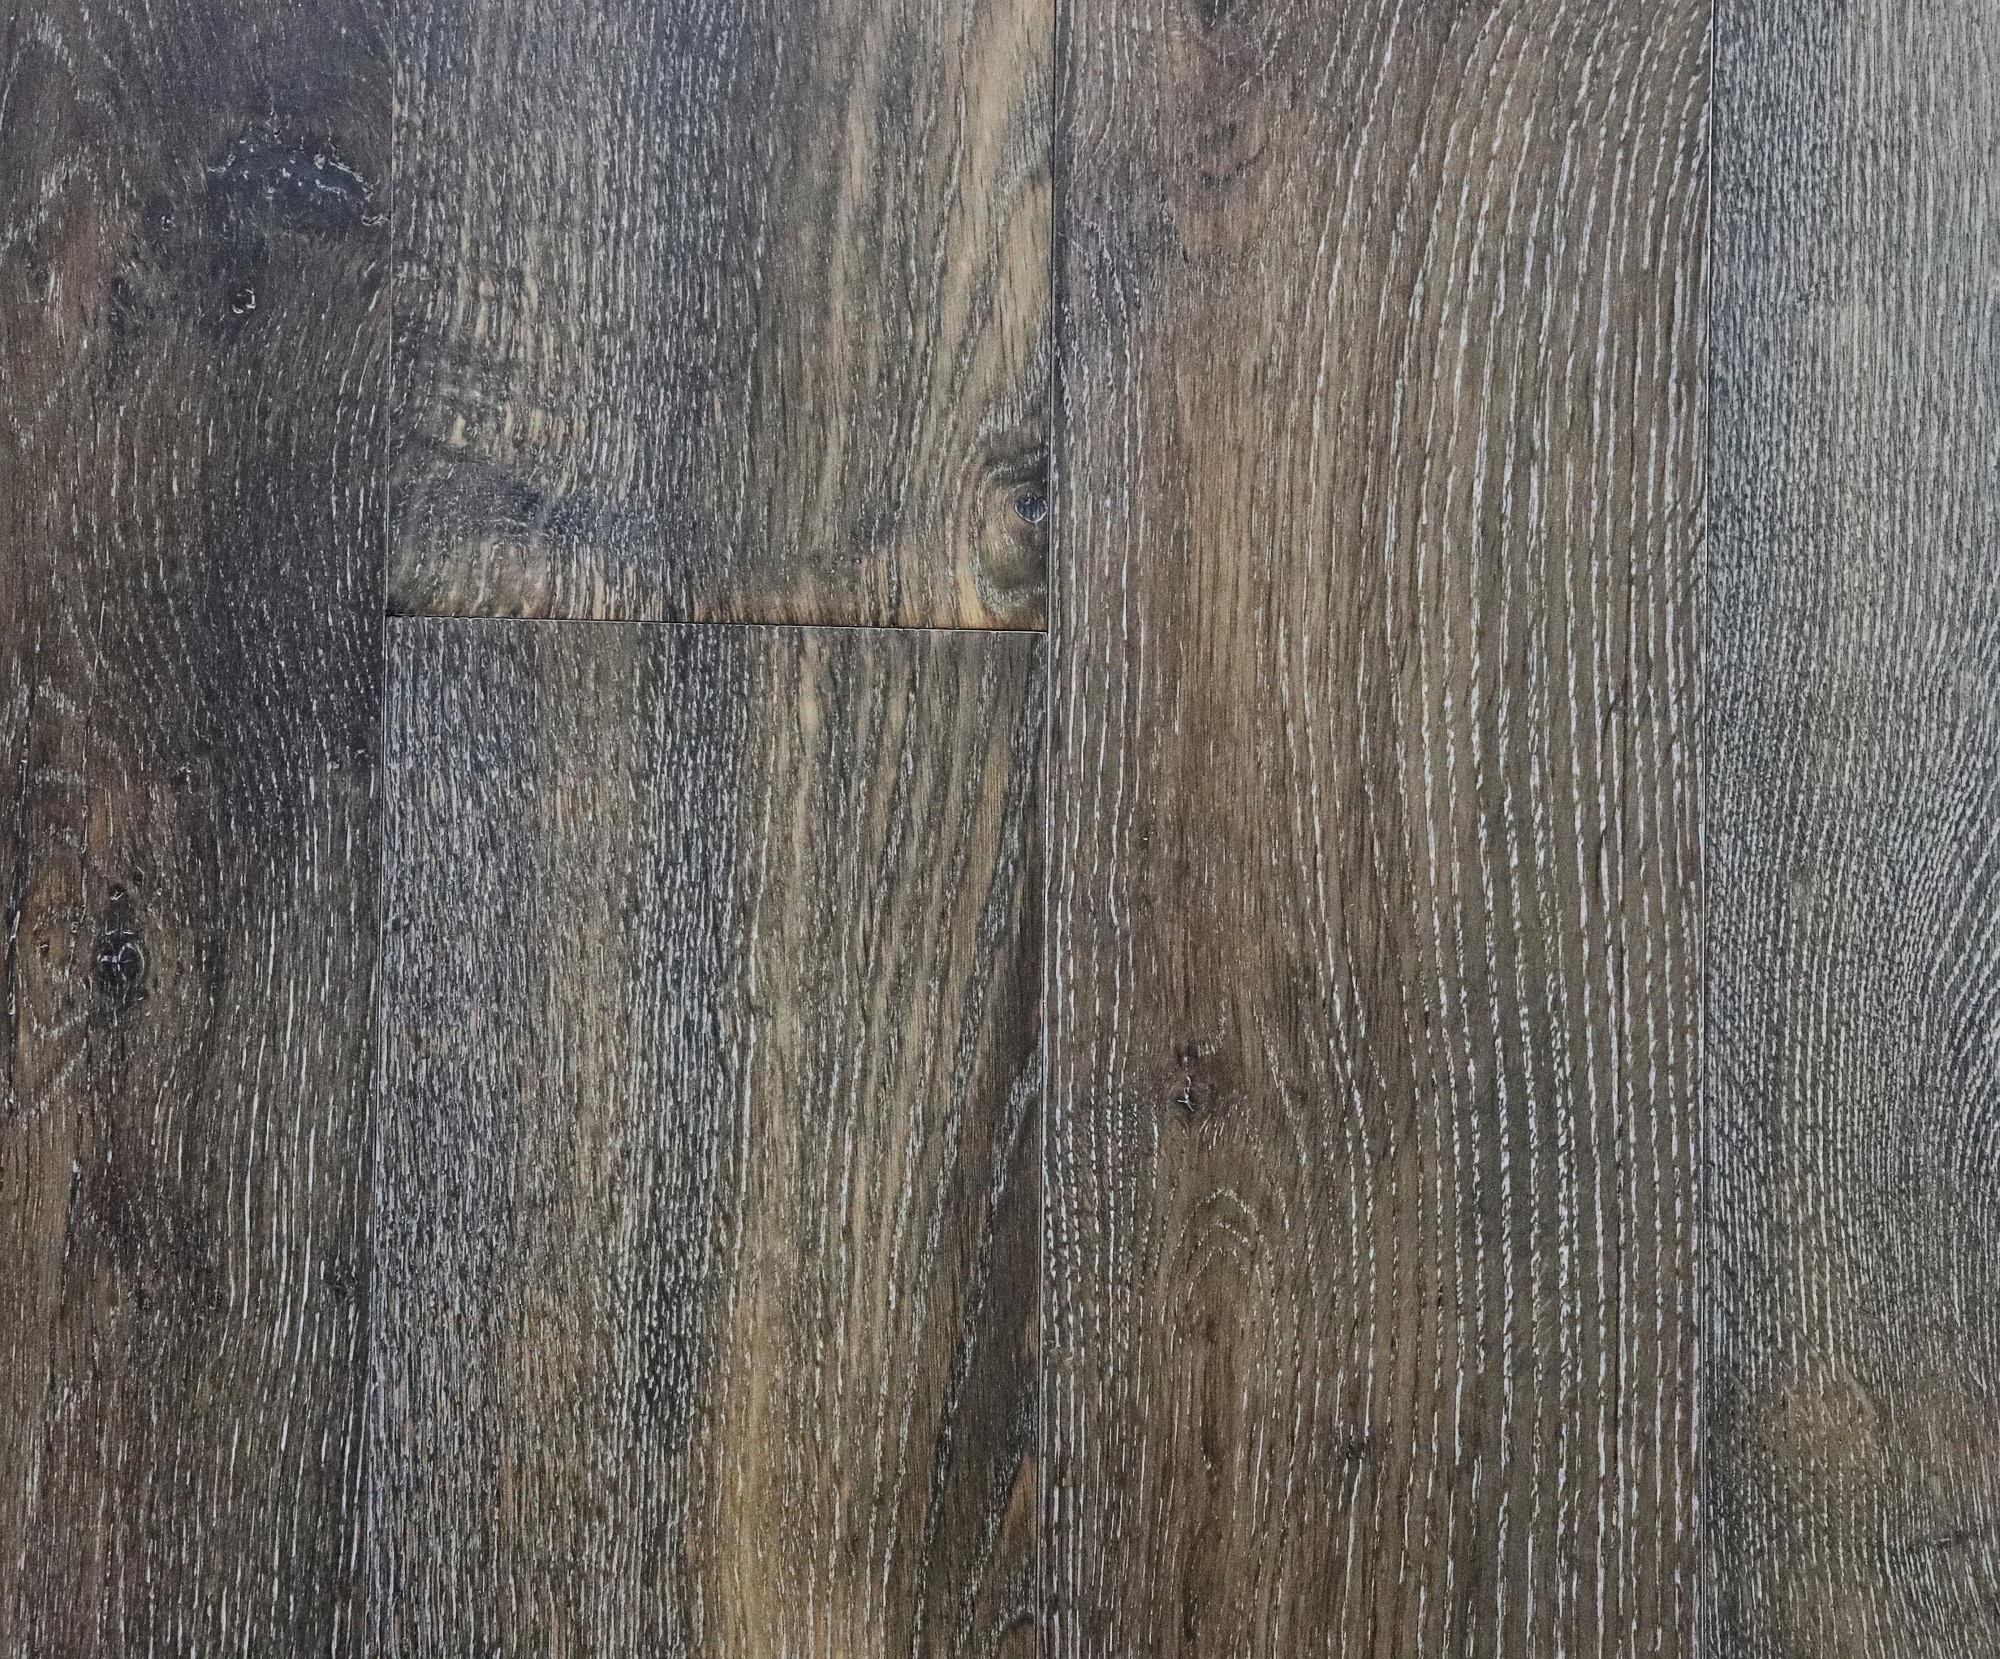 "Dust Storm / Treffert UV Cured Urethane Cross-Linked Fortified Finish / RL x 7-1/2 x 1/2"" Vernon Valley Collection, European Oak Engineered Hardwood 0"